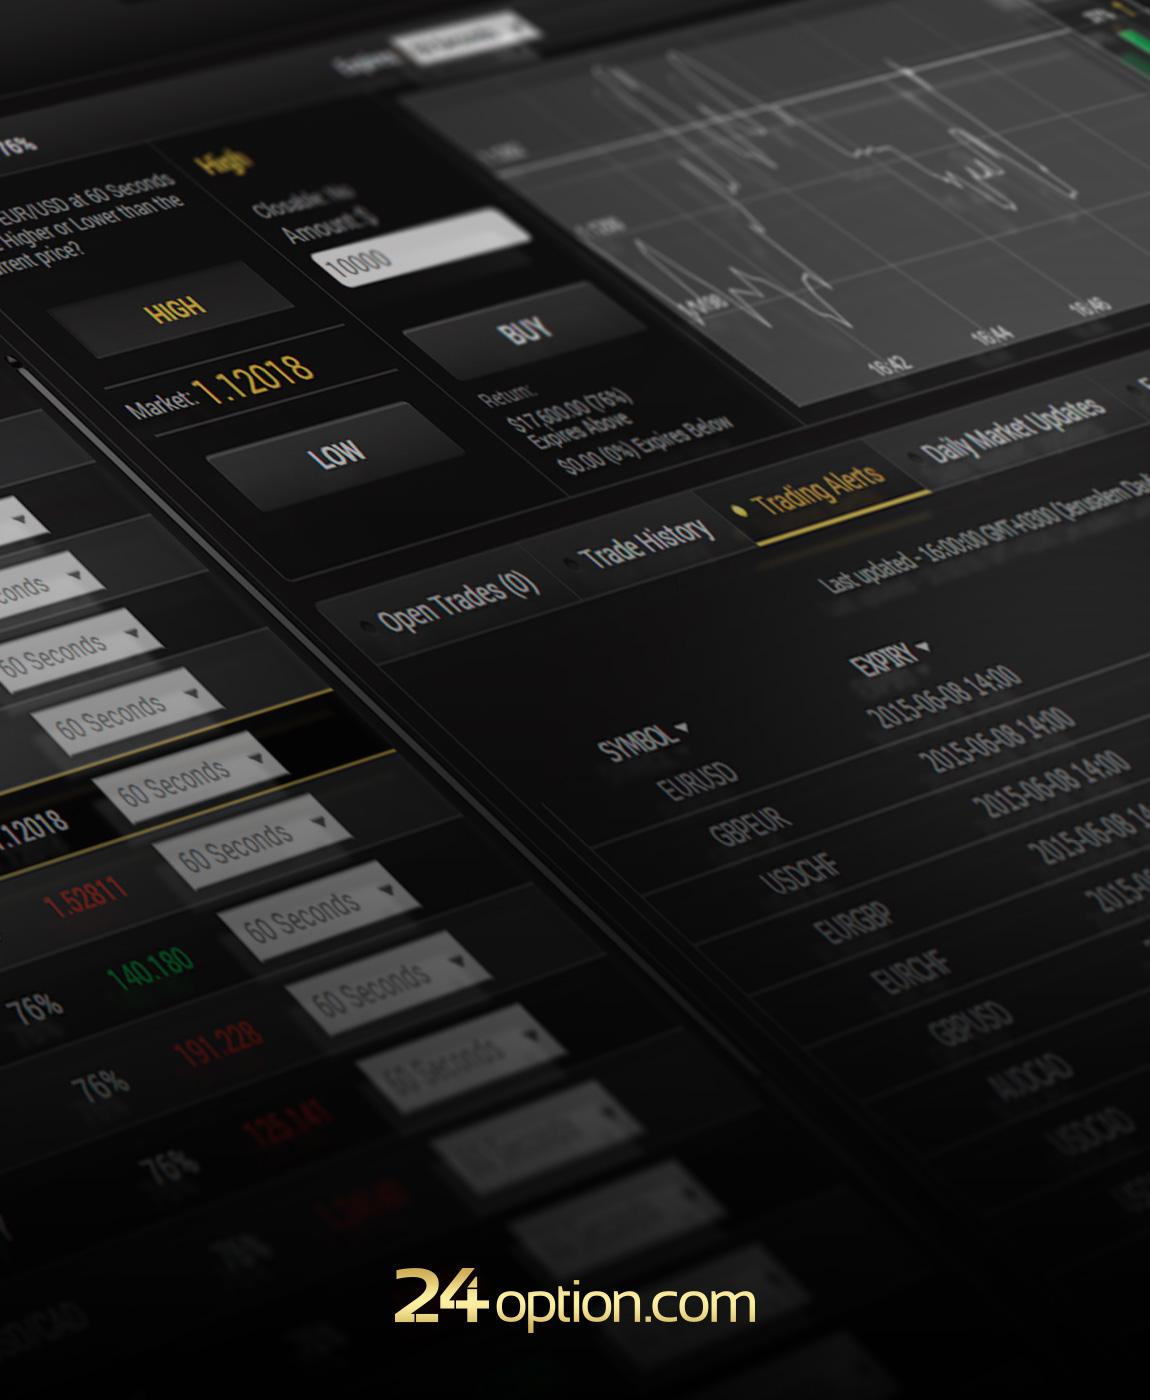 Binary options trading commodities